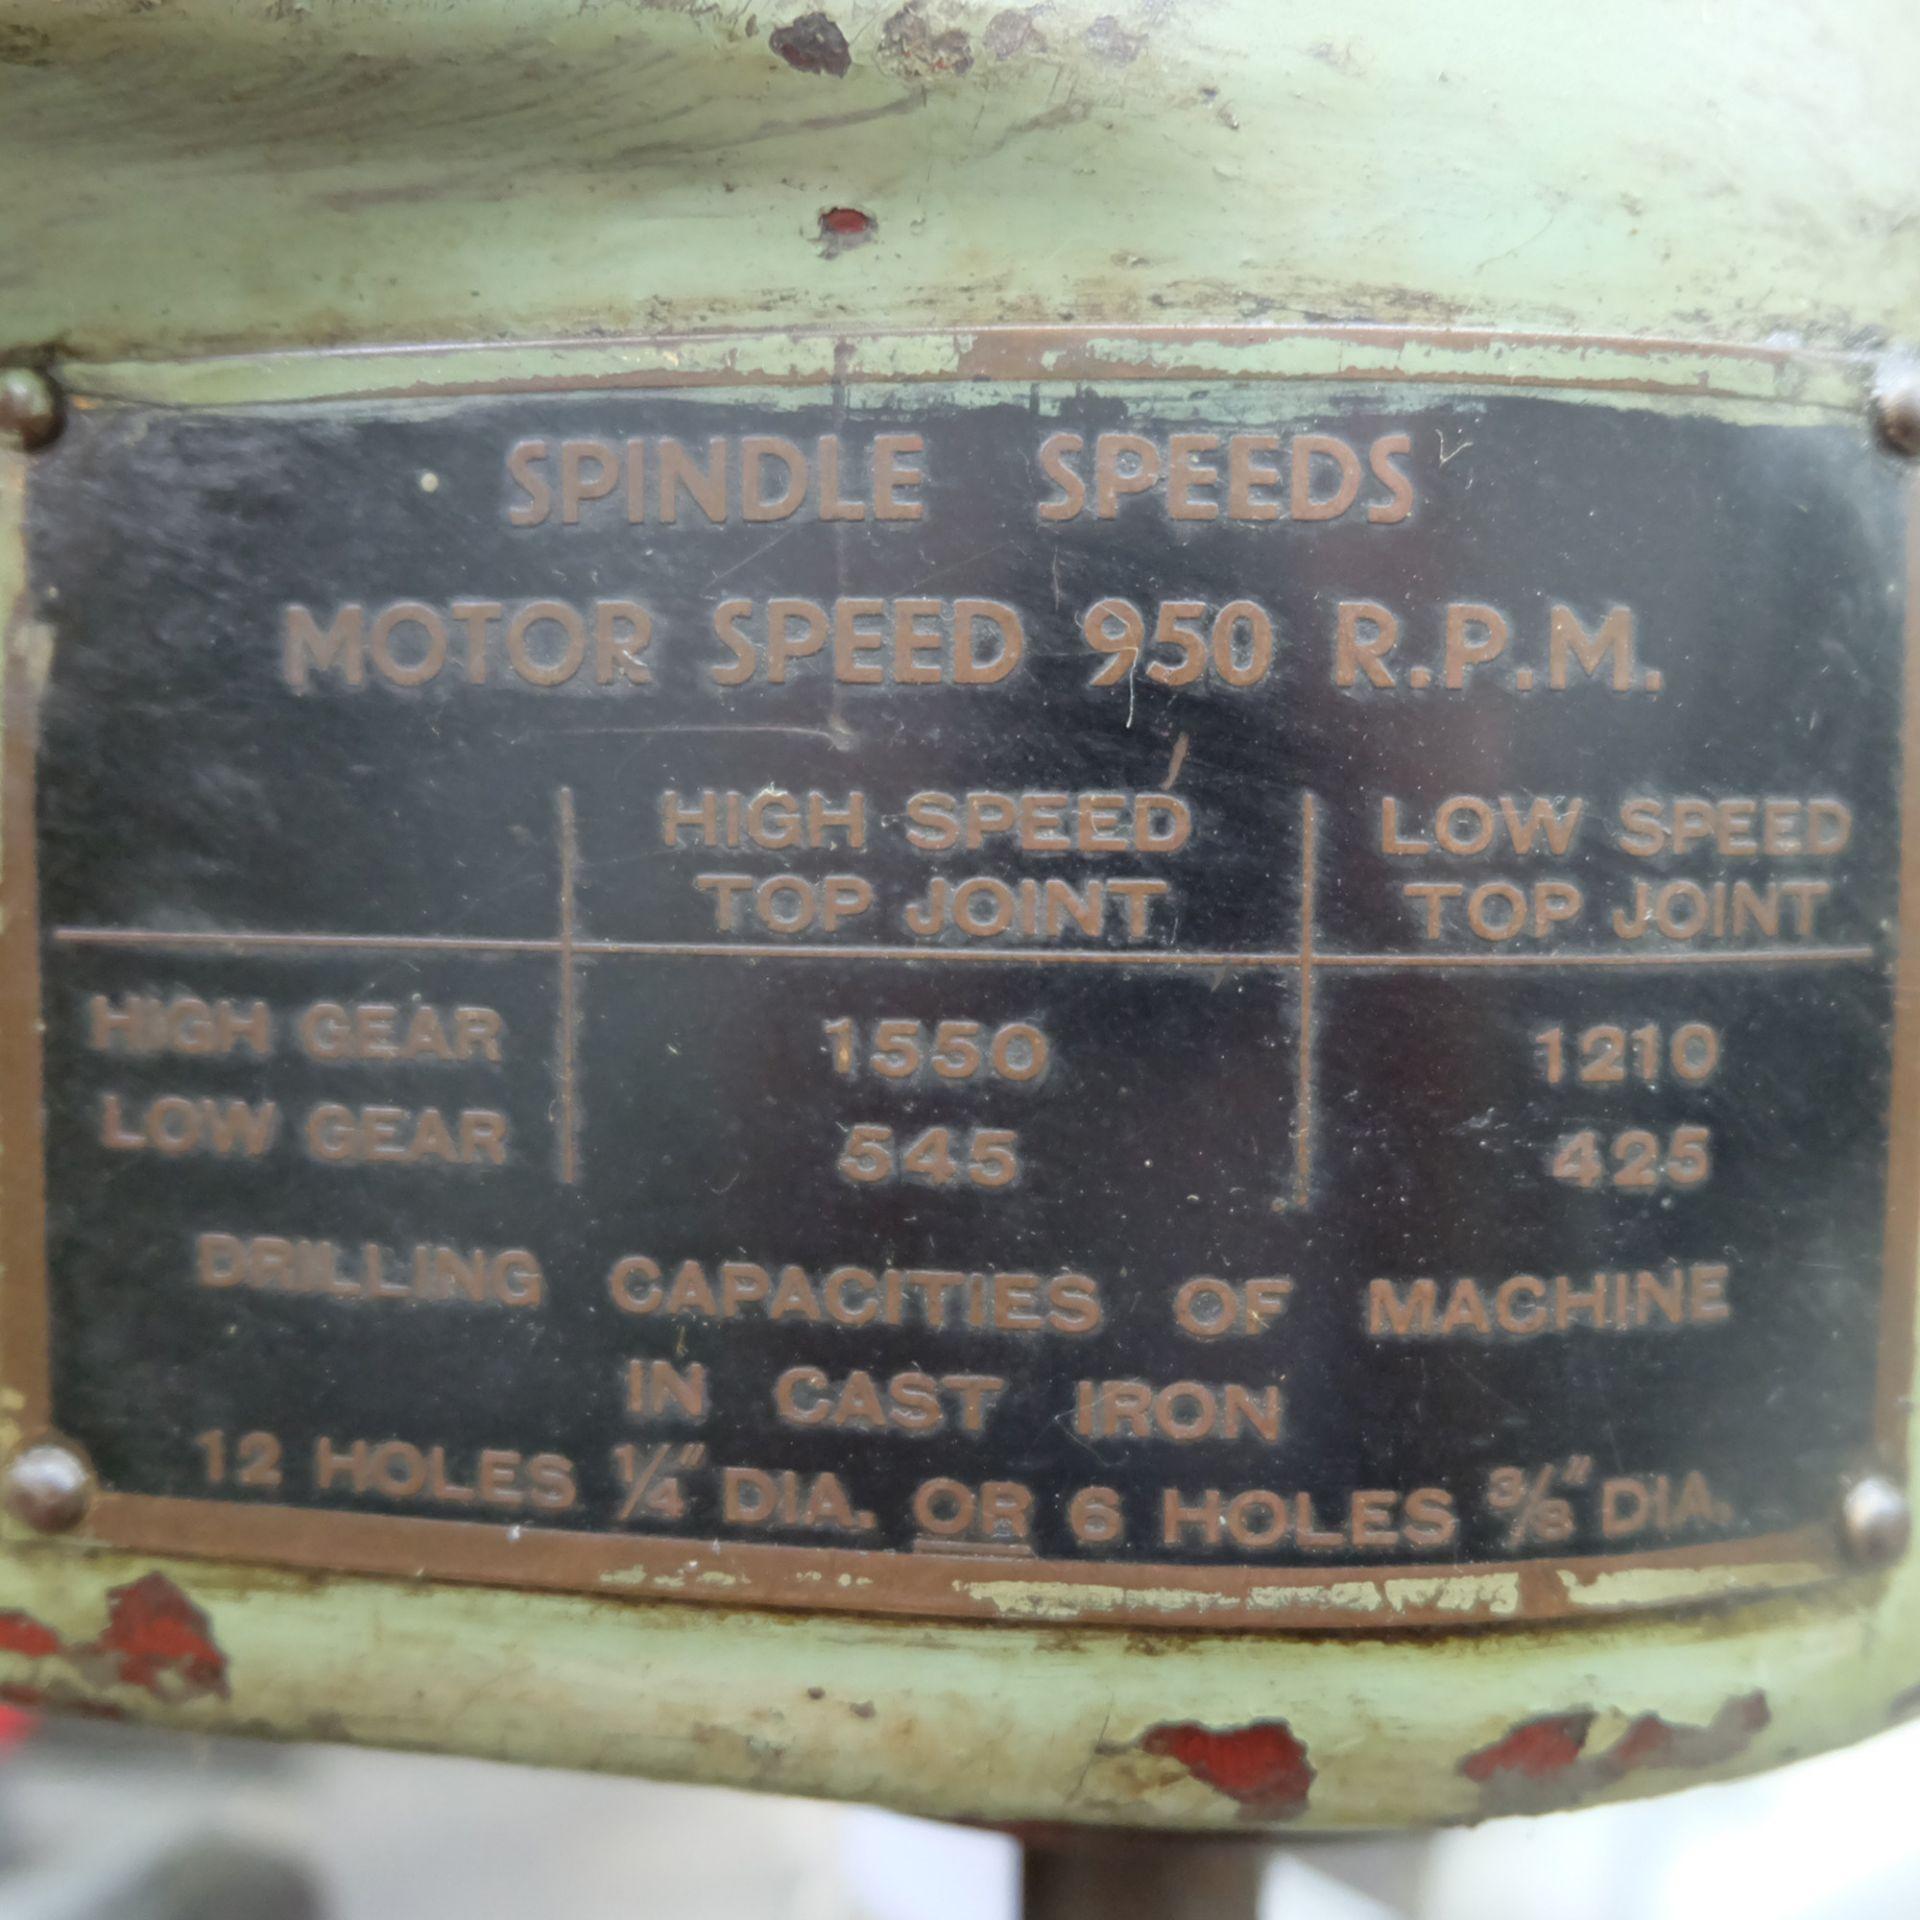 "Pollard Corona Model 12MXT Multi Spindle Head Drill. Table Size 14"" x 8 1/2"". - Image 7 of 7"